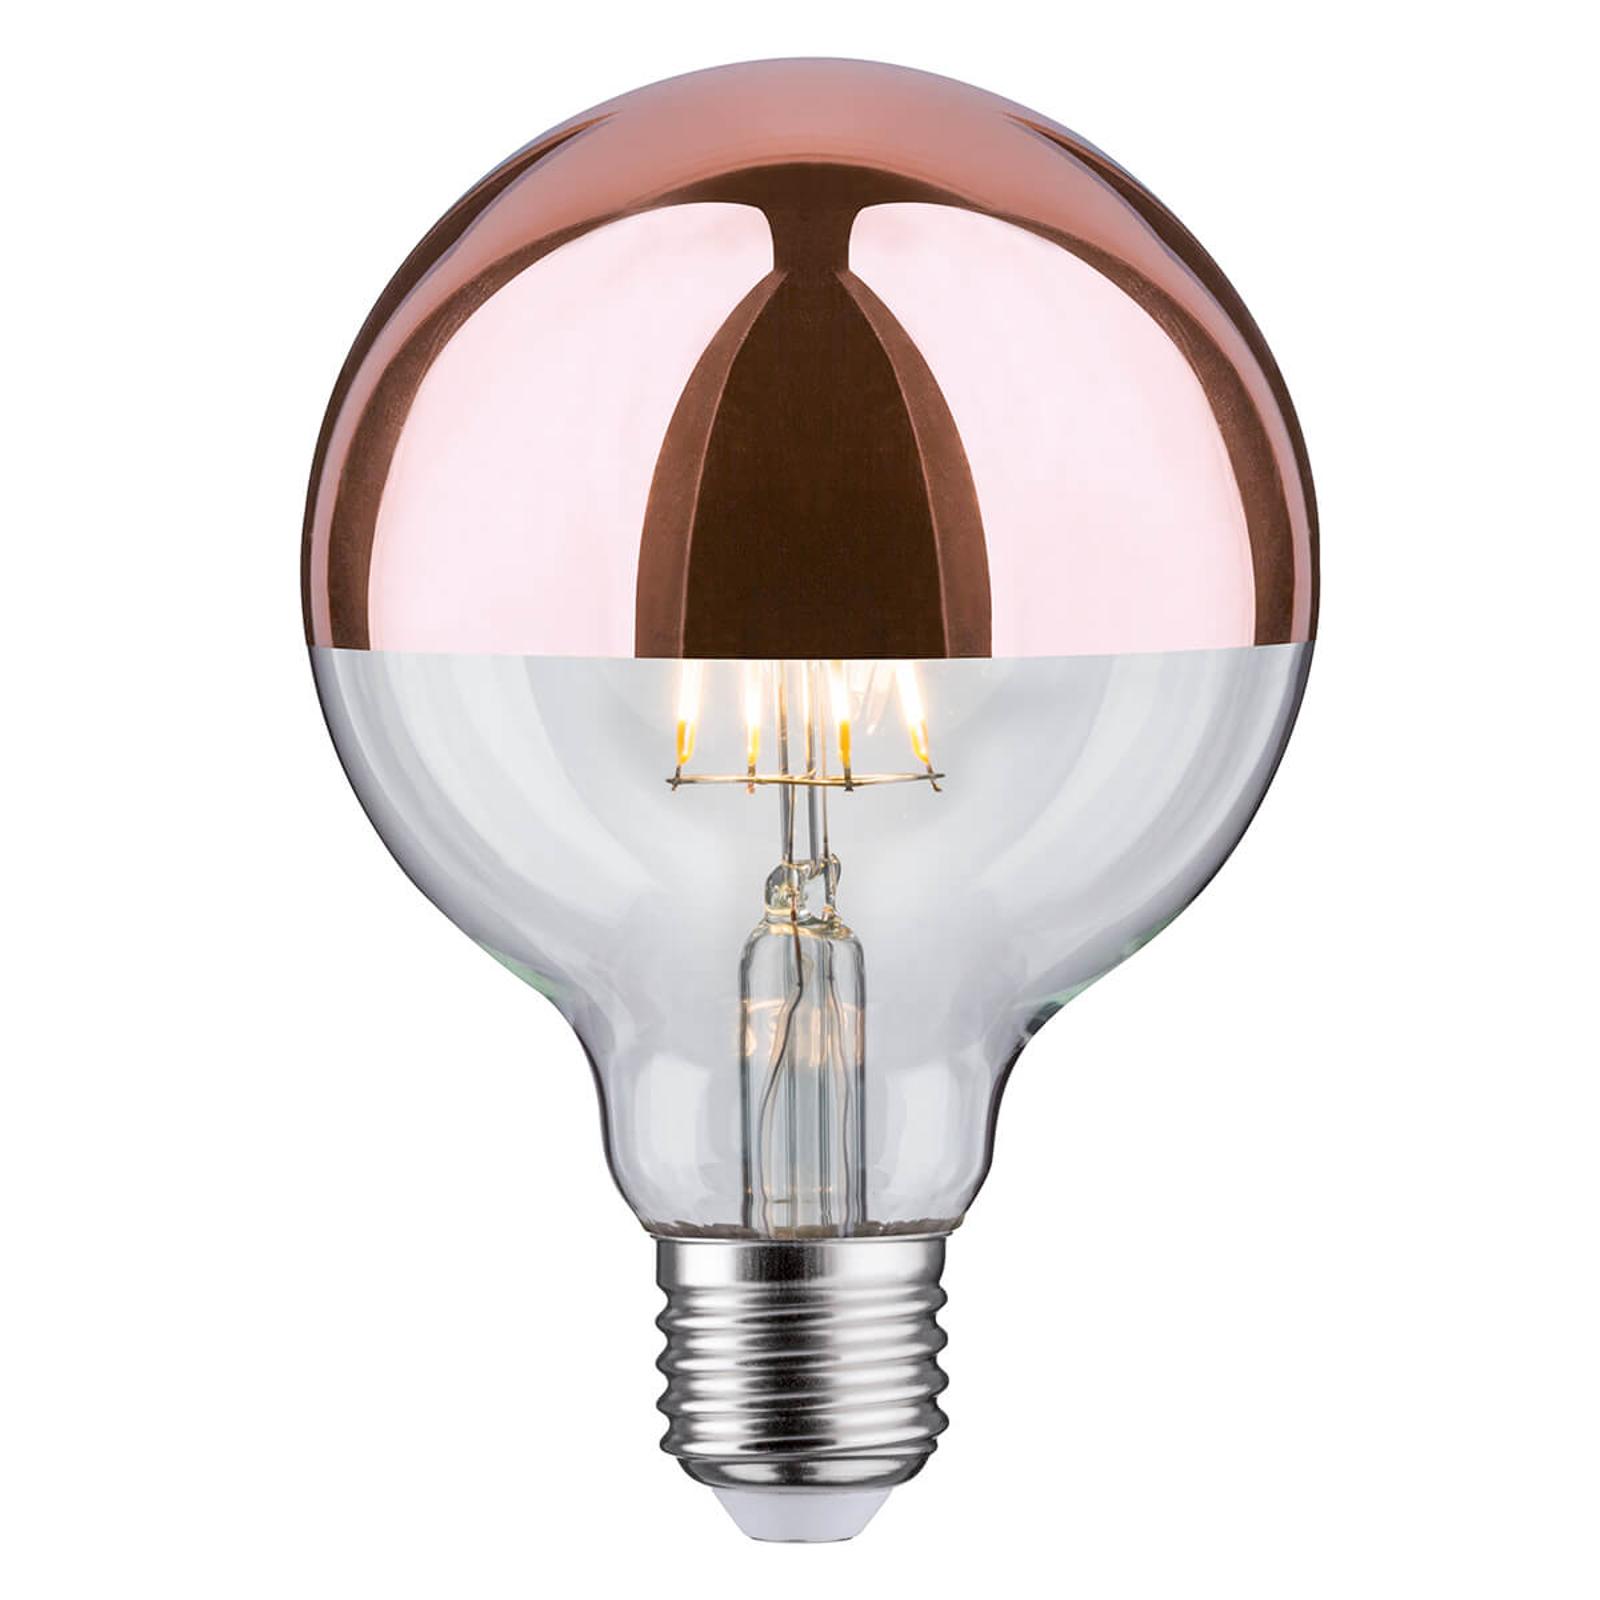 Paulmann LED-toppförspeglad lampa E27 6,5 W G95